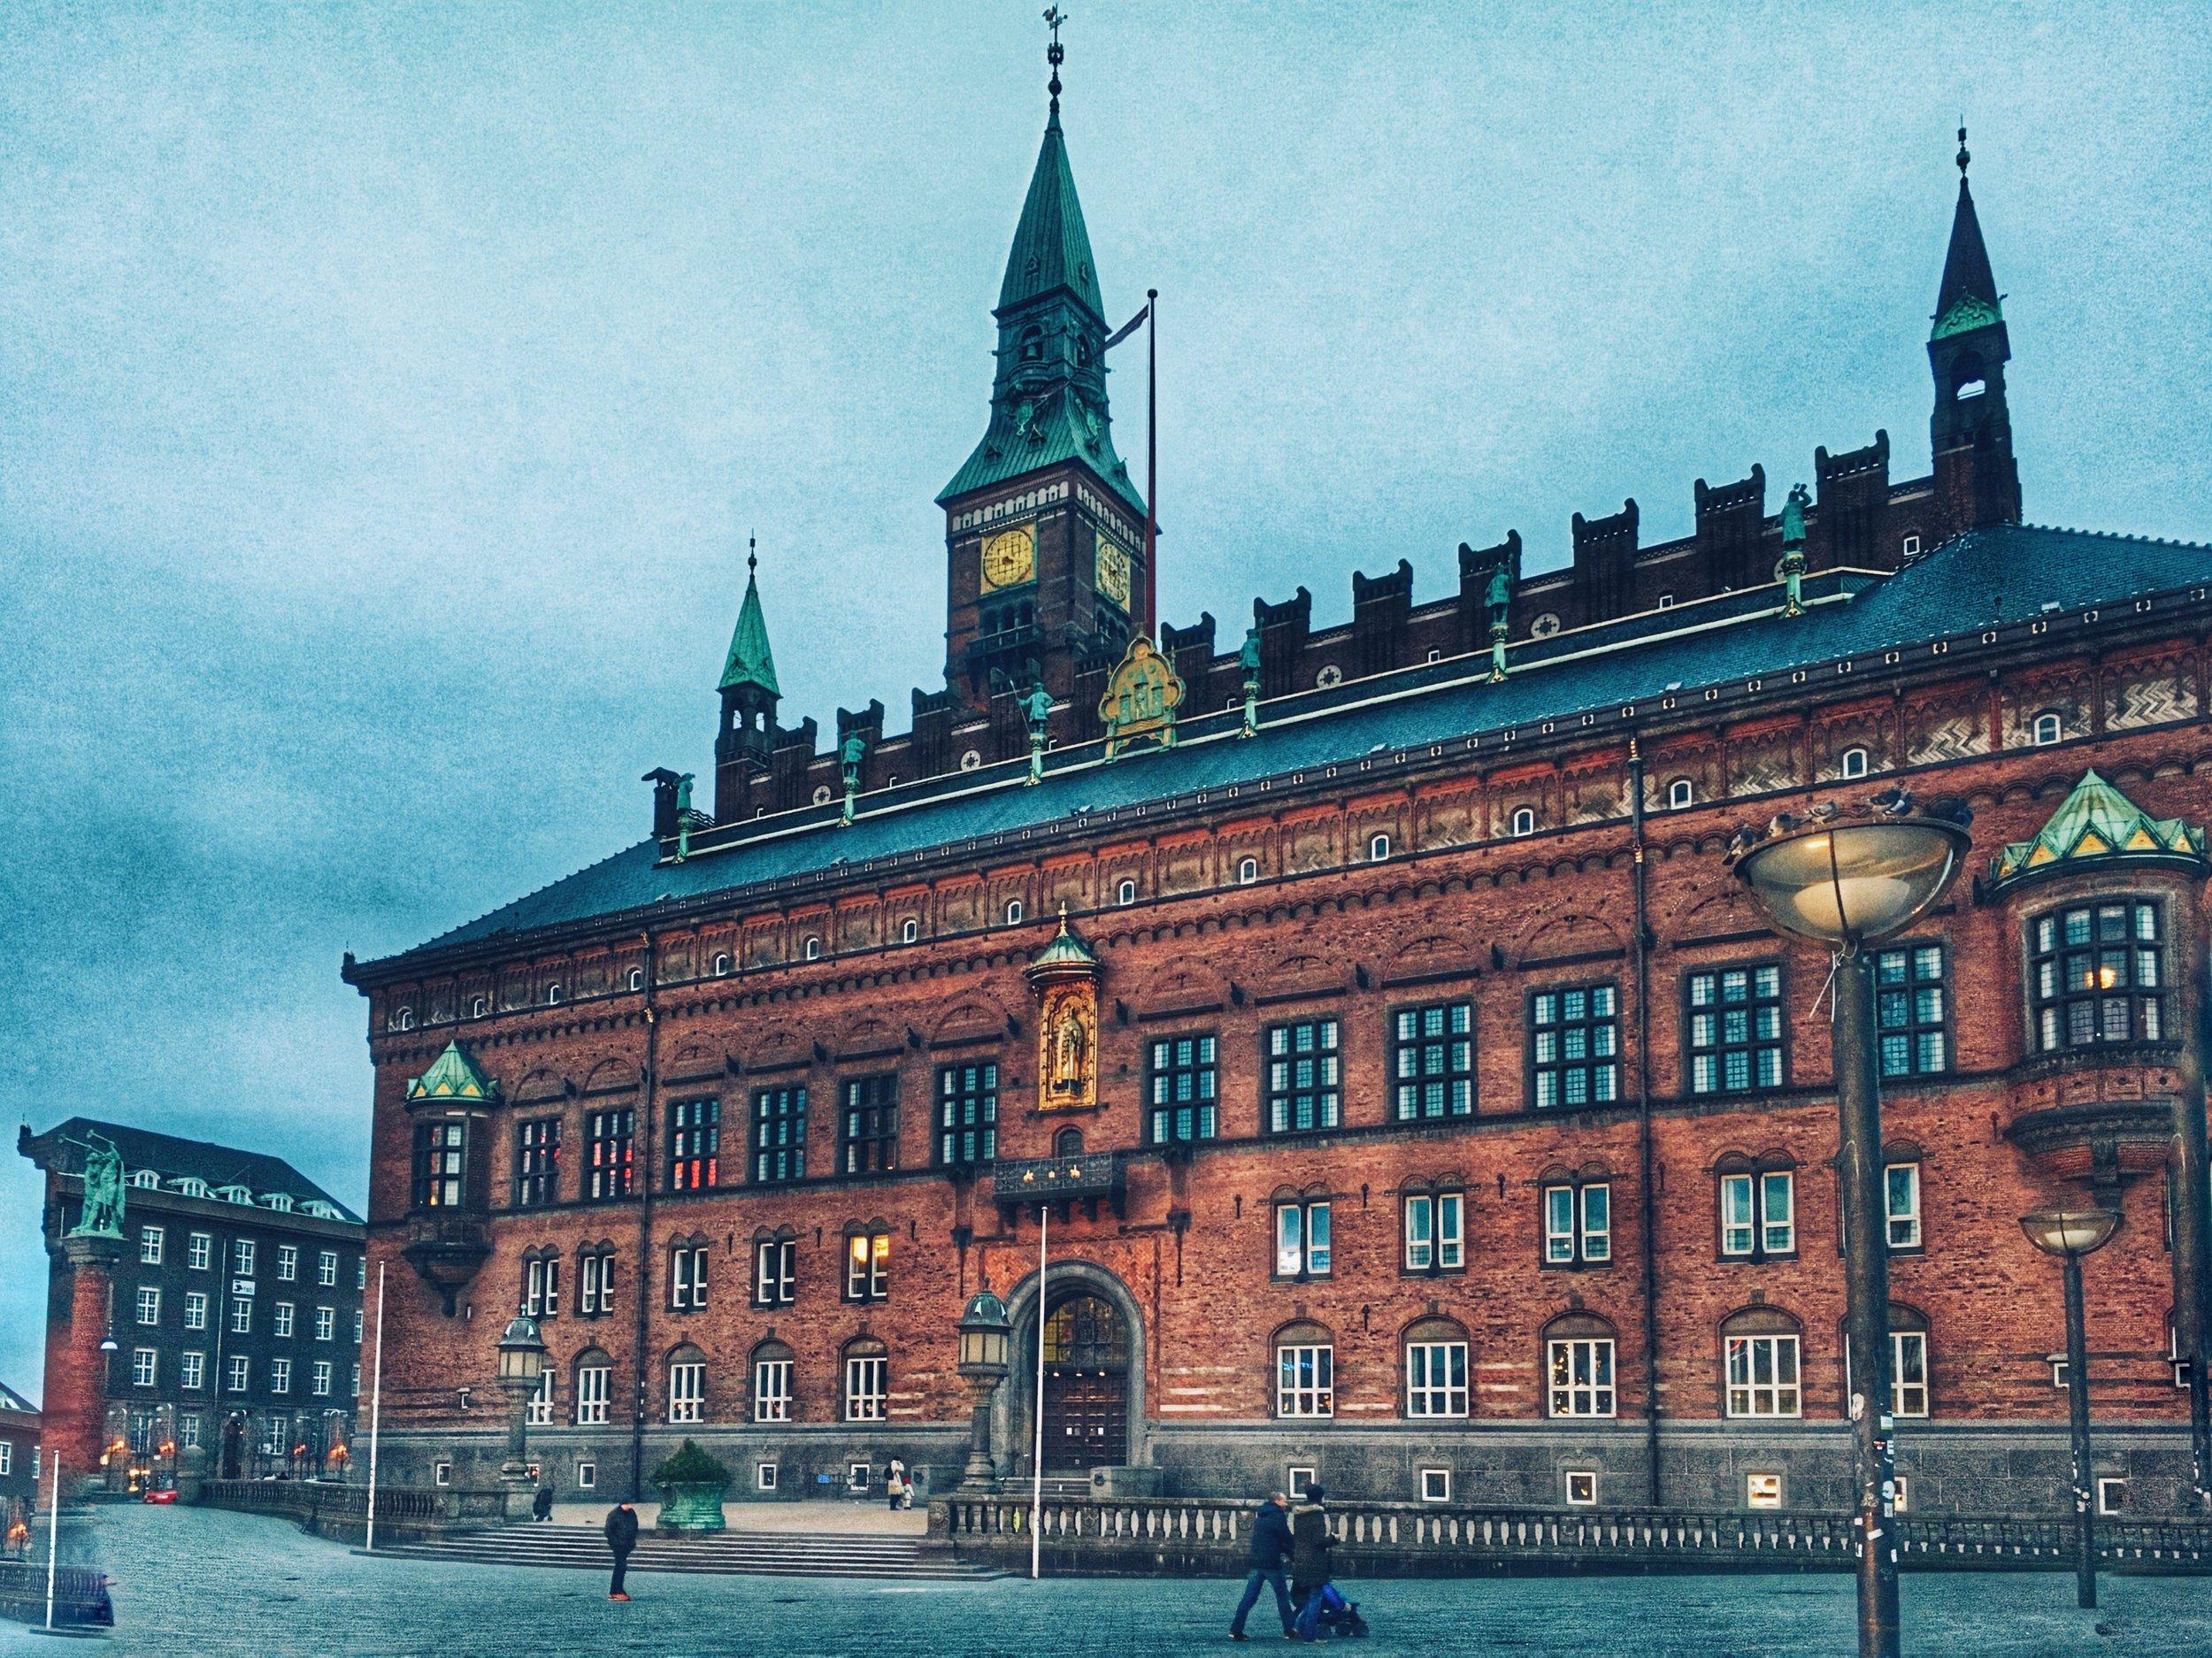 Copenhagen - working on it